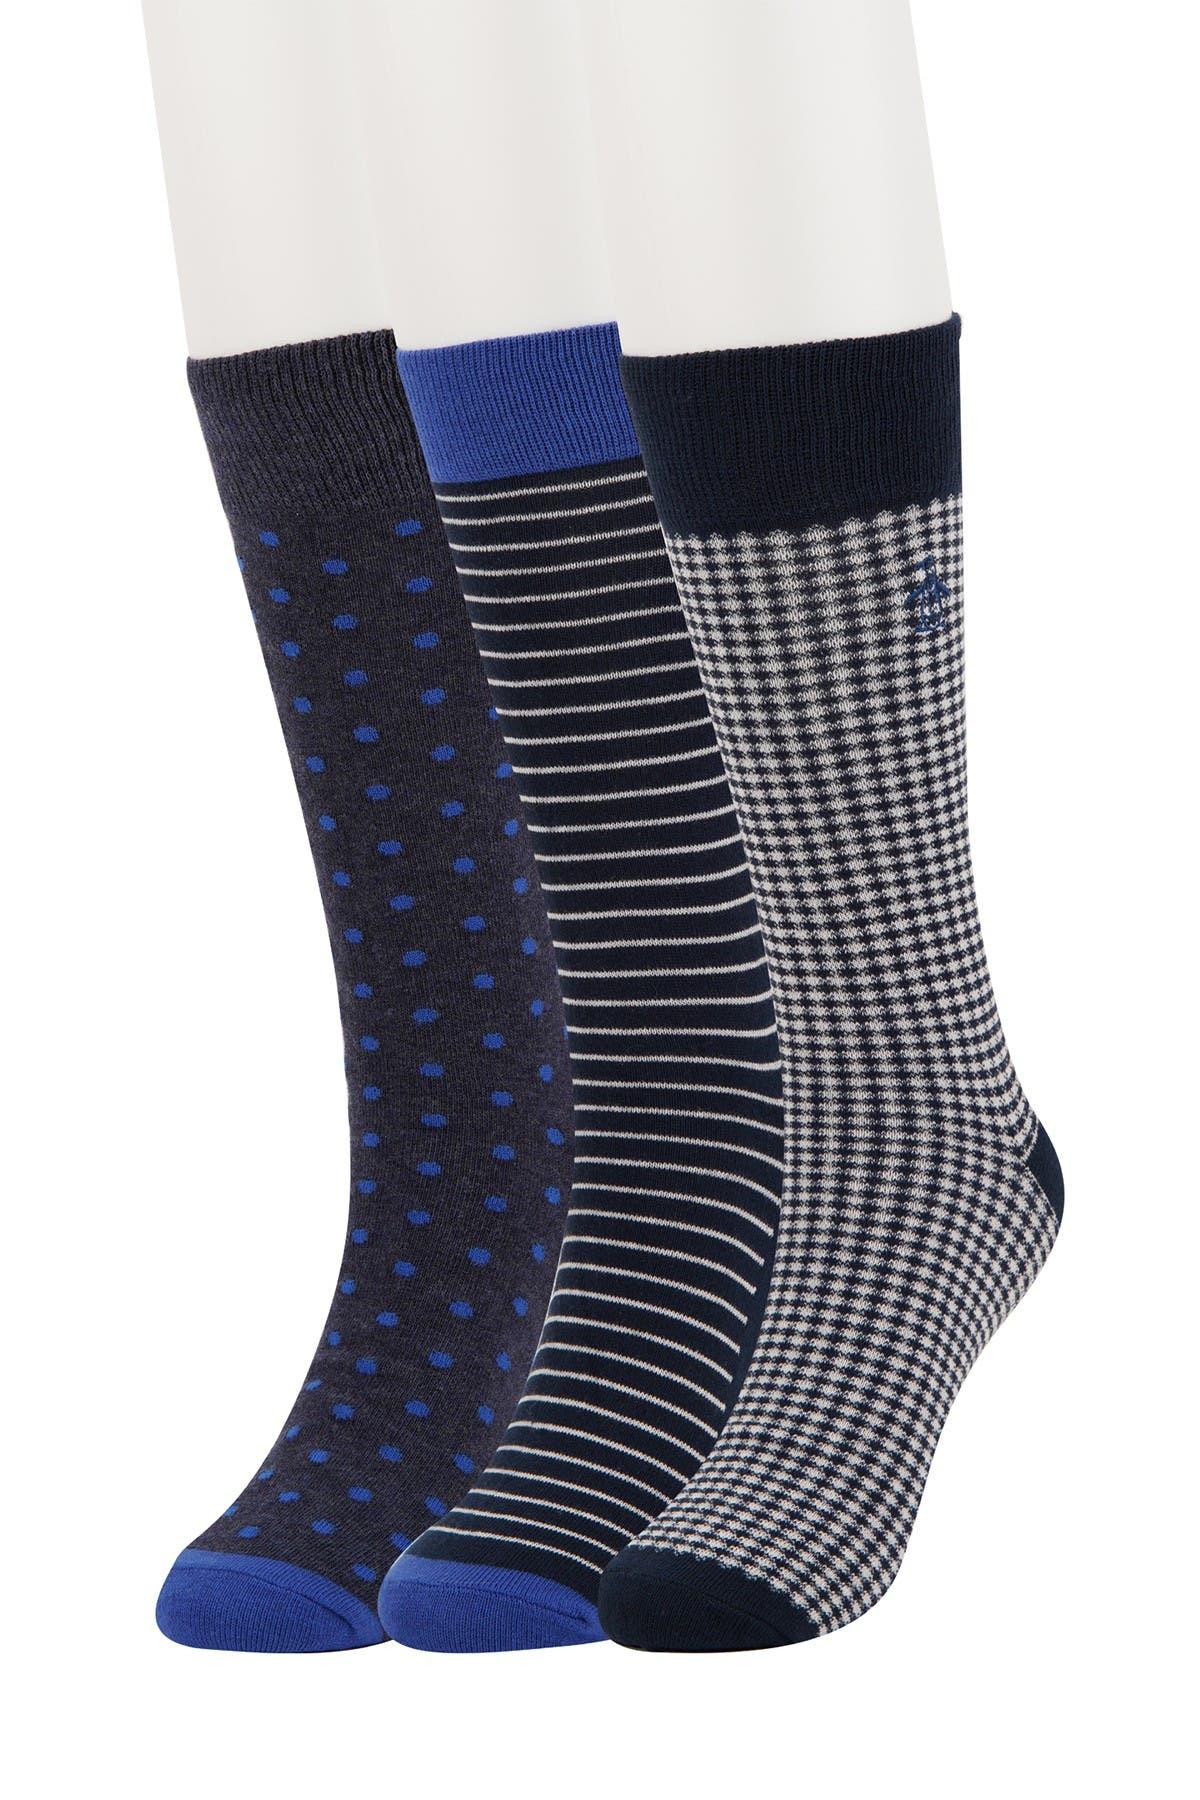 Image of Original Penguin Lewis Gingham Socks - Pack of 3